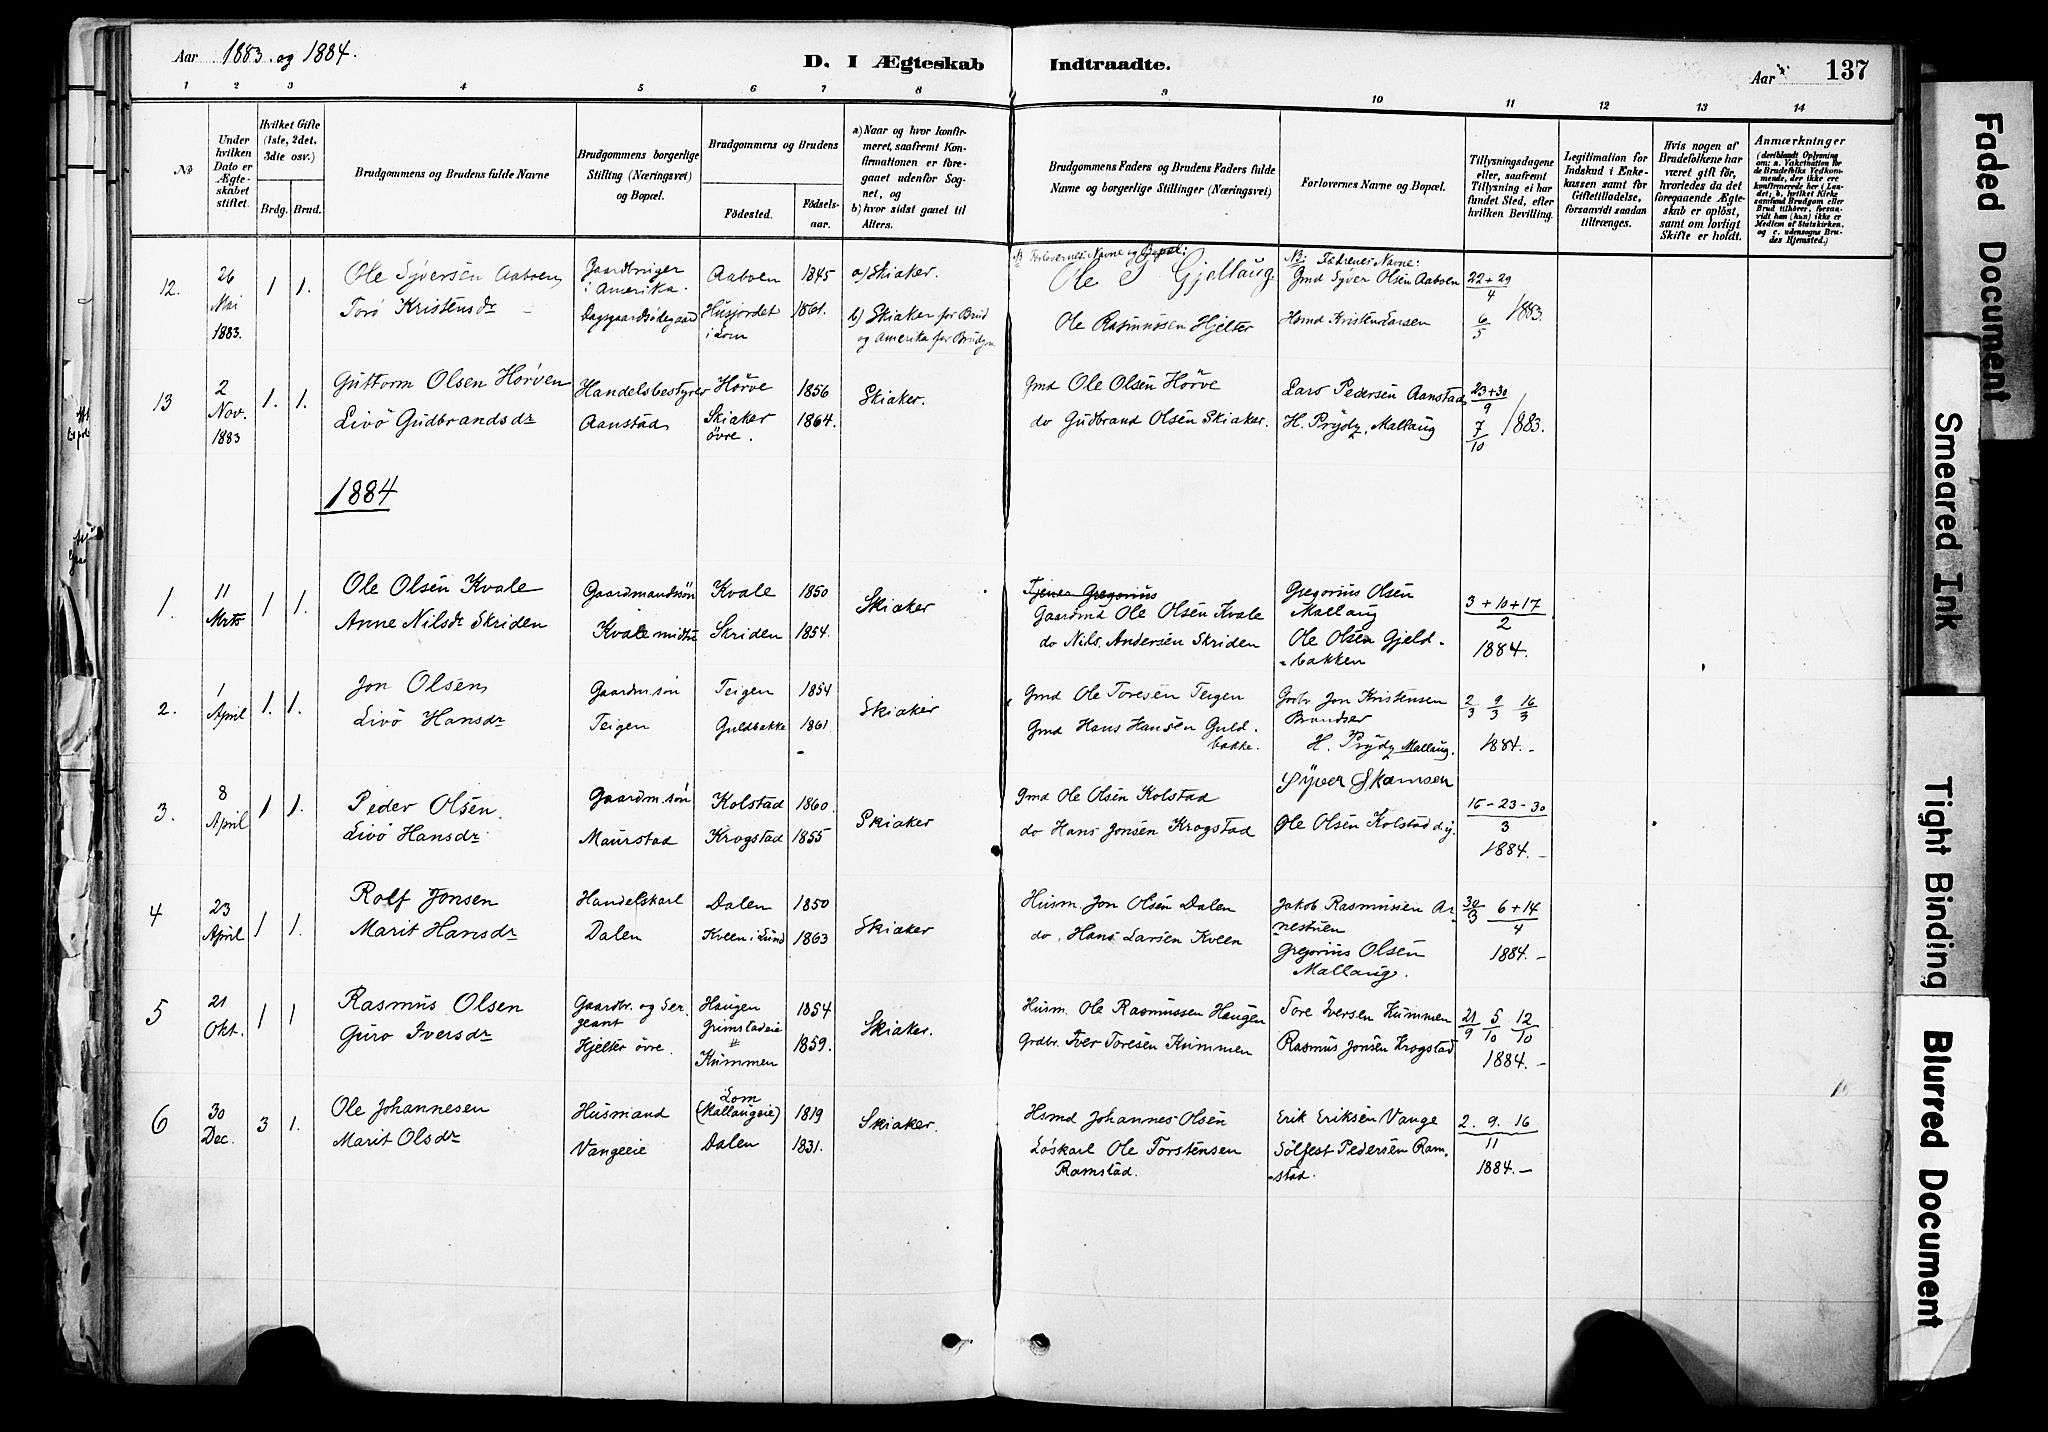 SAH, Skjåk prestekontor, Ministerialbok nr. 3, 1880-1907, s. 137